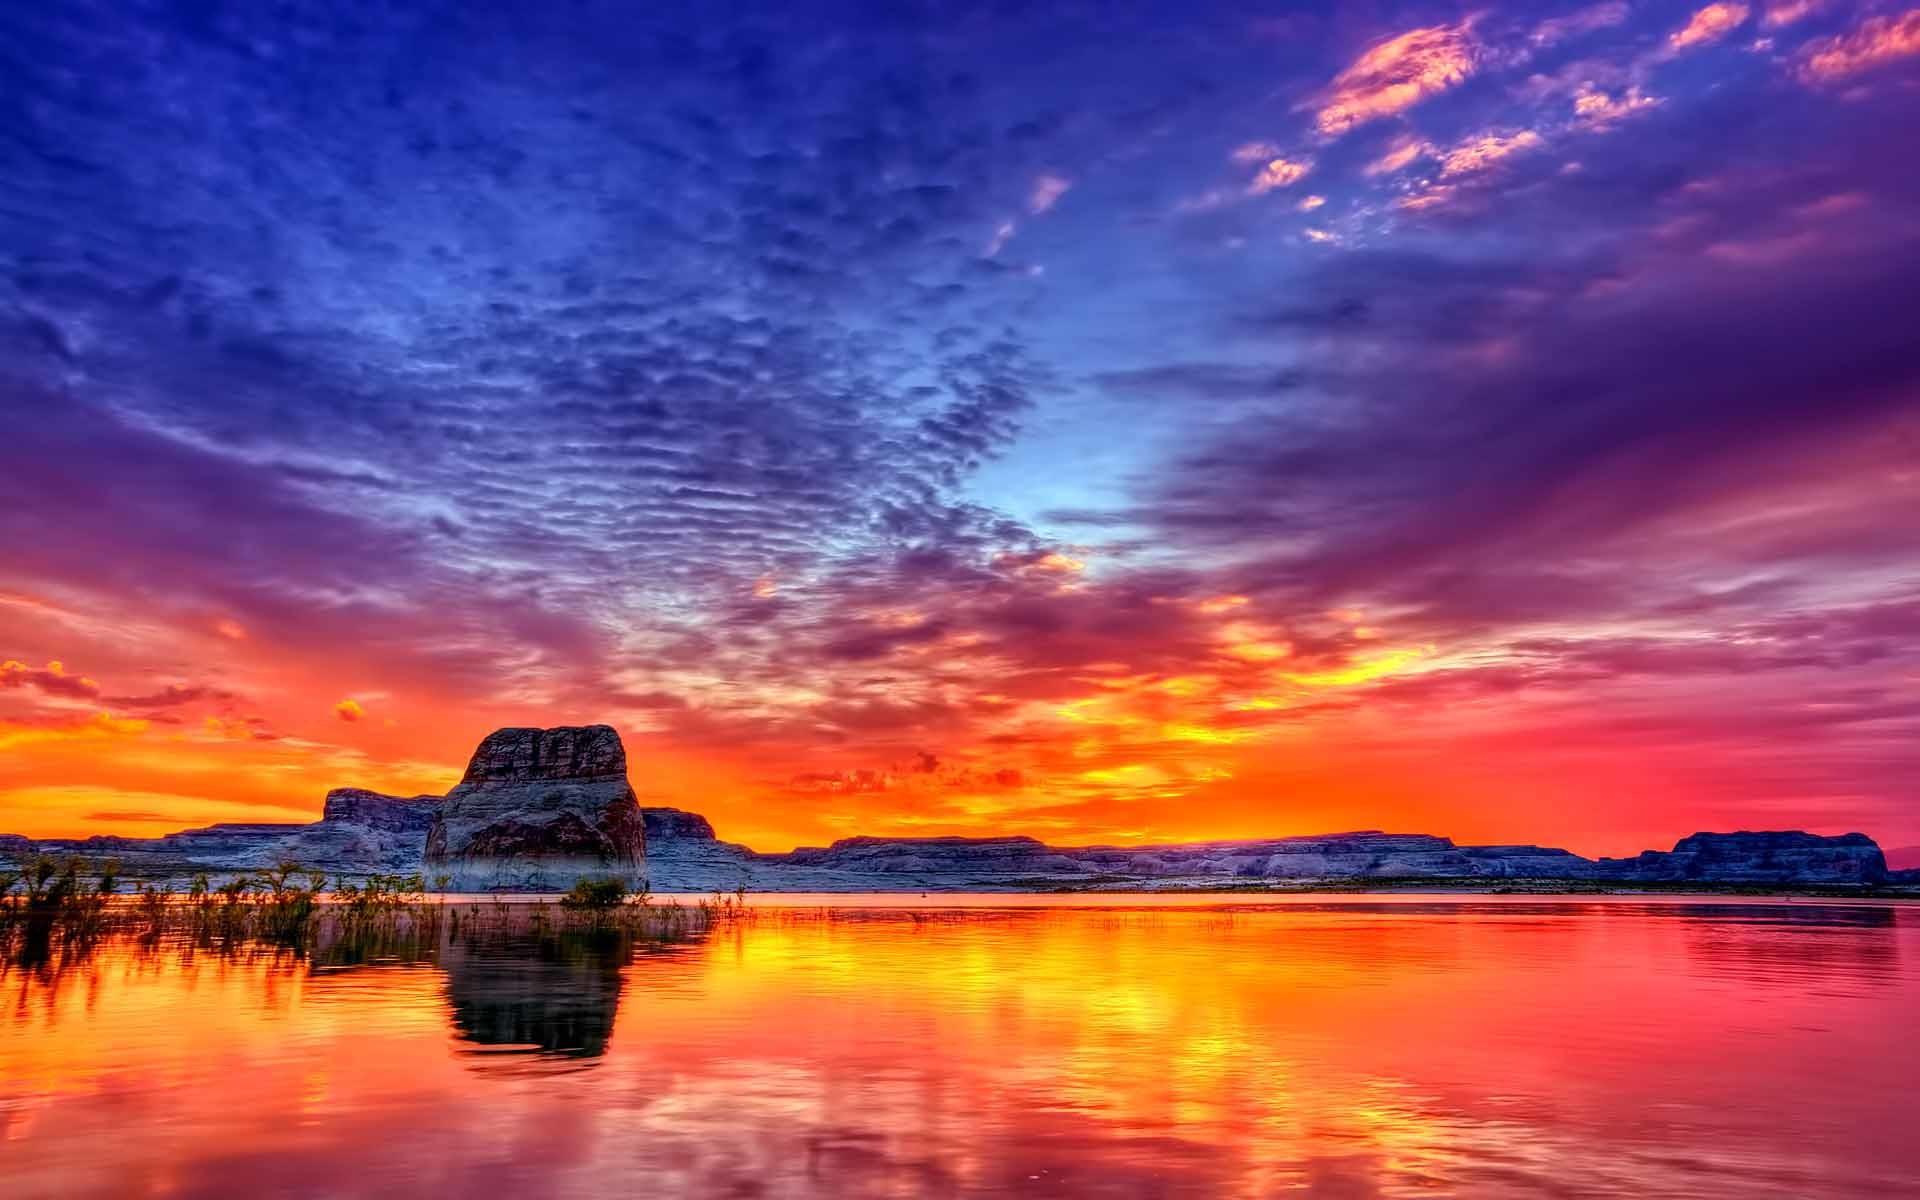 Amazing Wallpaper Laptop Sunset - 710276-best-sunset-wallpaper-desktop-1920x1200-laptop  2018_28678.jpg